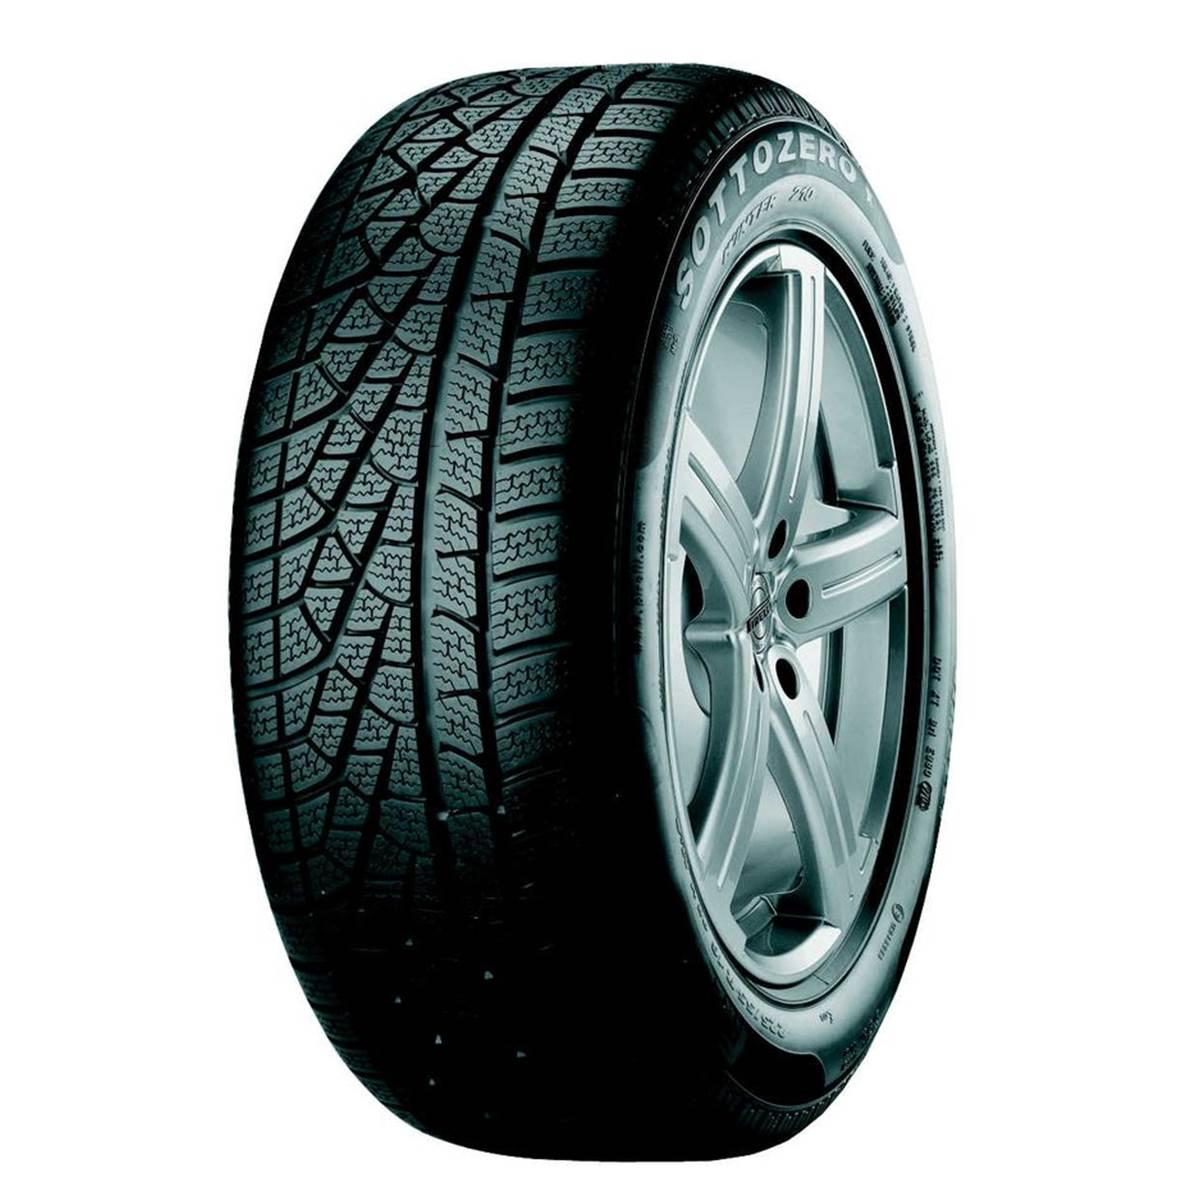 Pirelli Winter Sottozero 3 Homologue Jaguar Xl